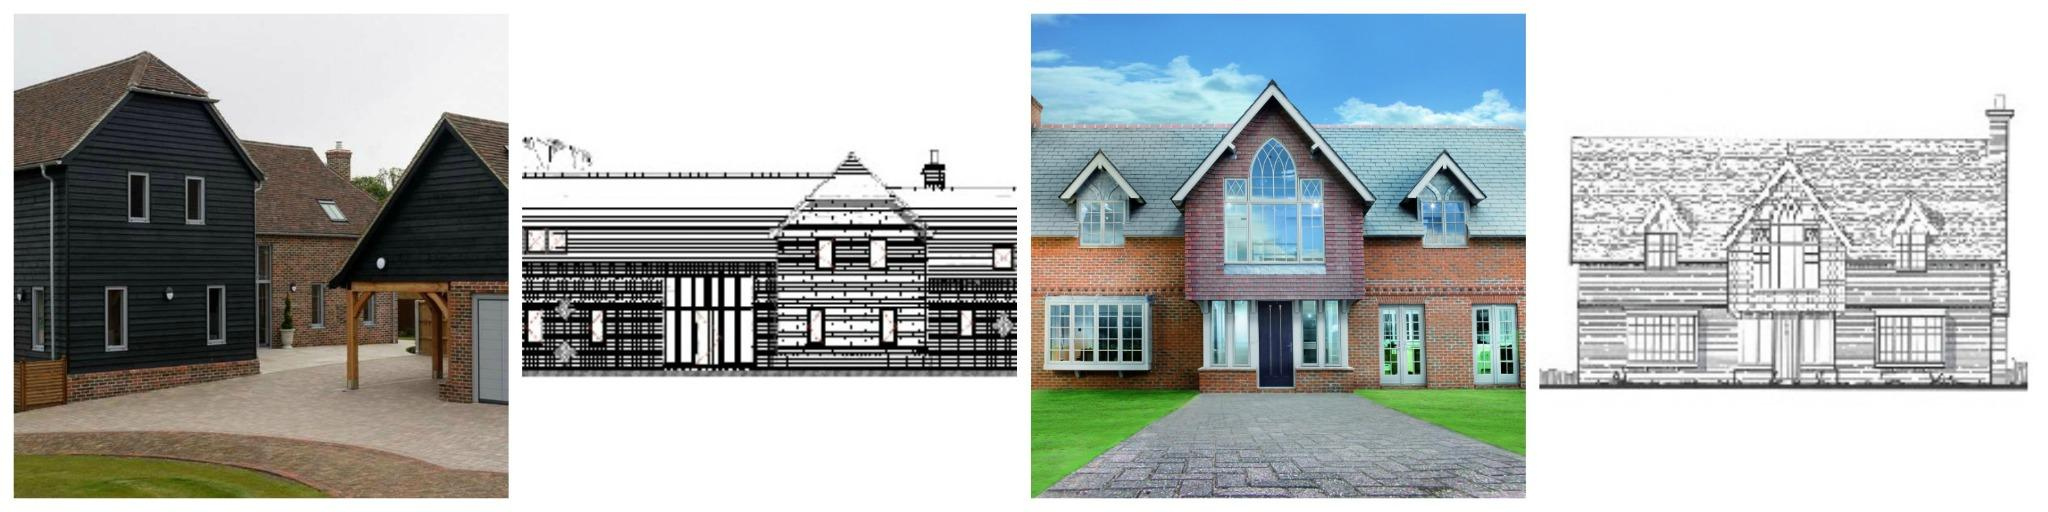 Wickhambrook Self Build Style Home